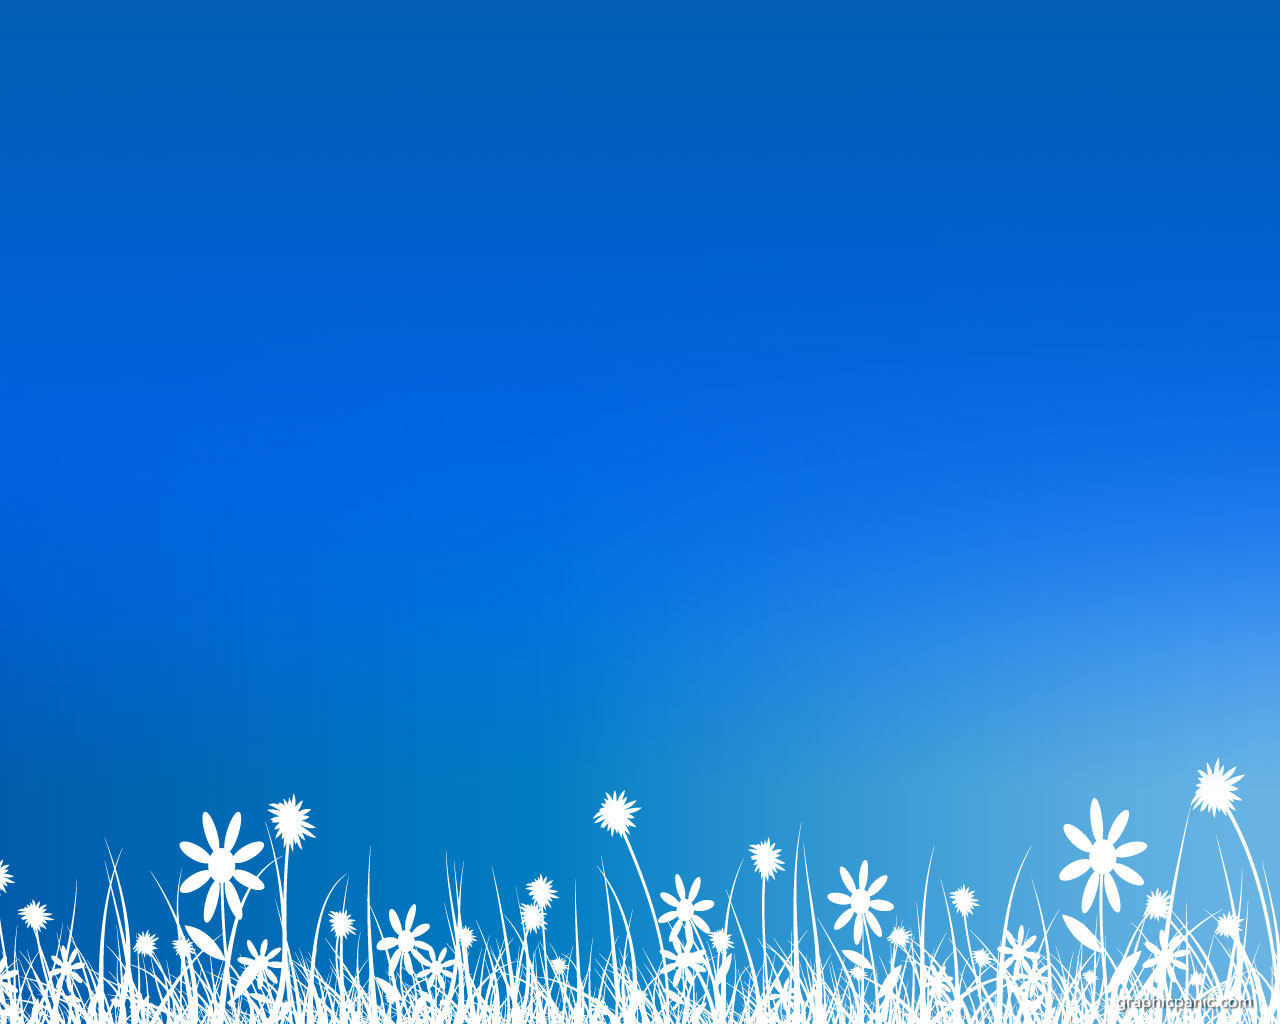 White and Blue Wallpaper - WallpaperSafari